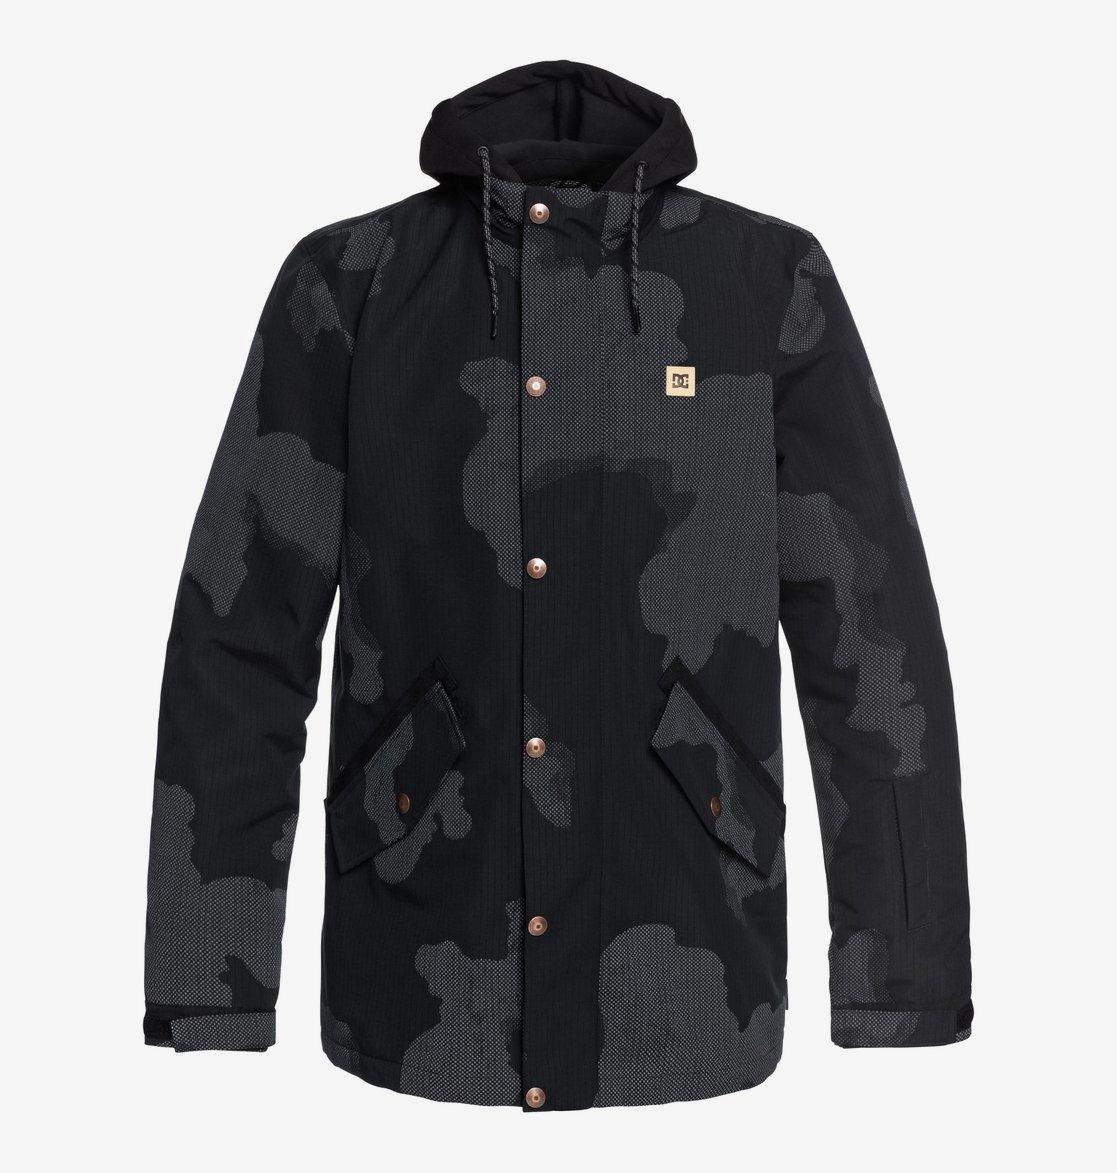 Union Se - Reflective Snow Jacket for Men  EDYTJ03079